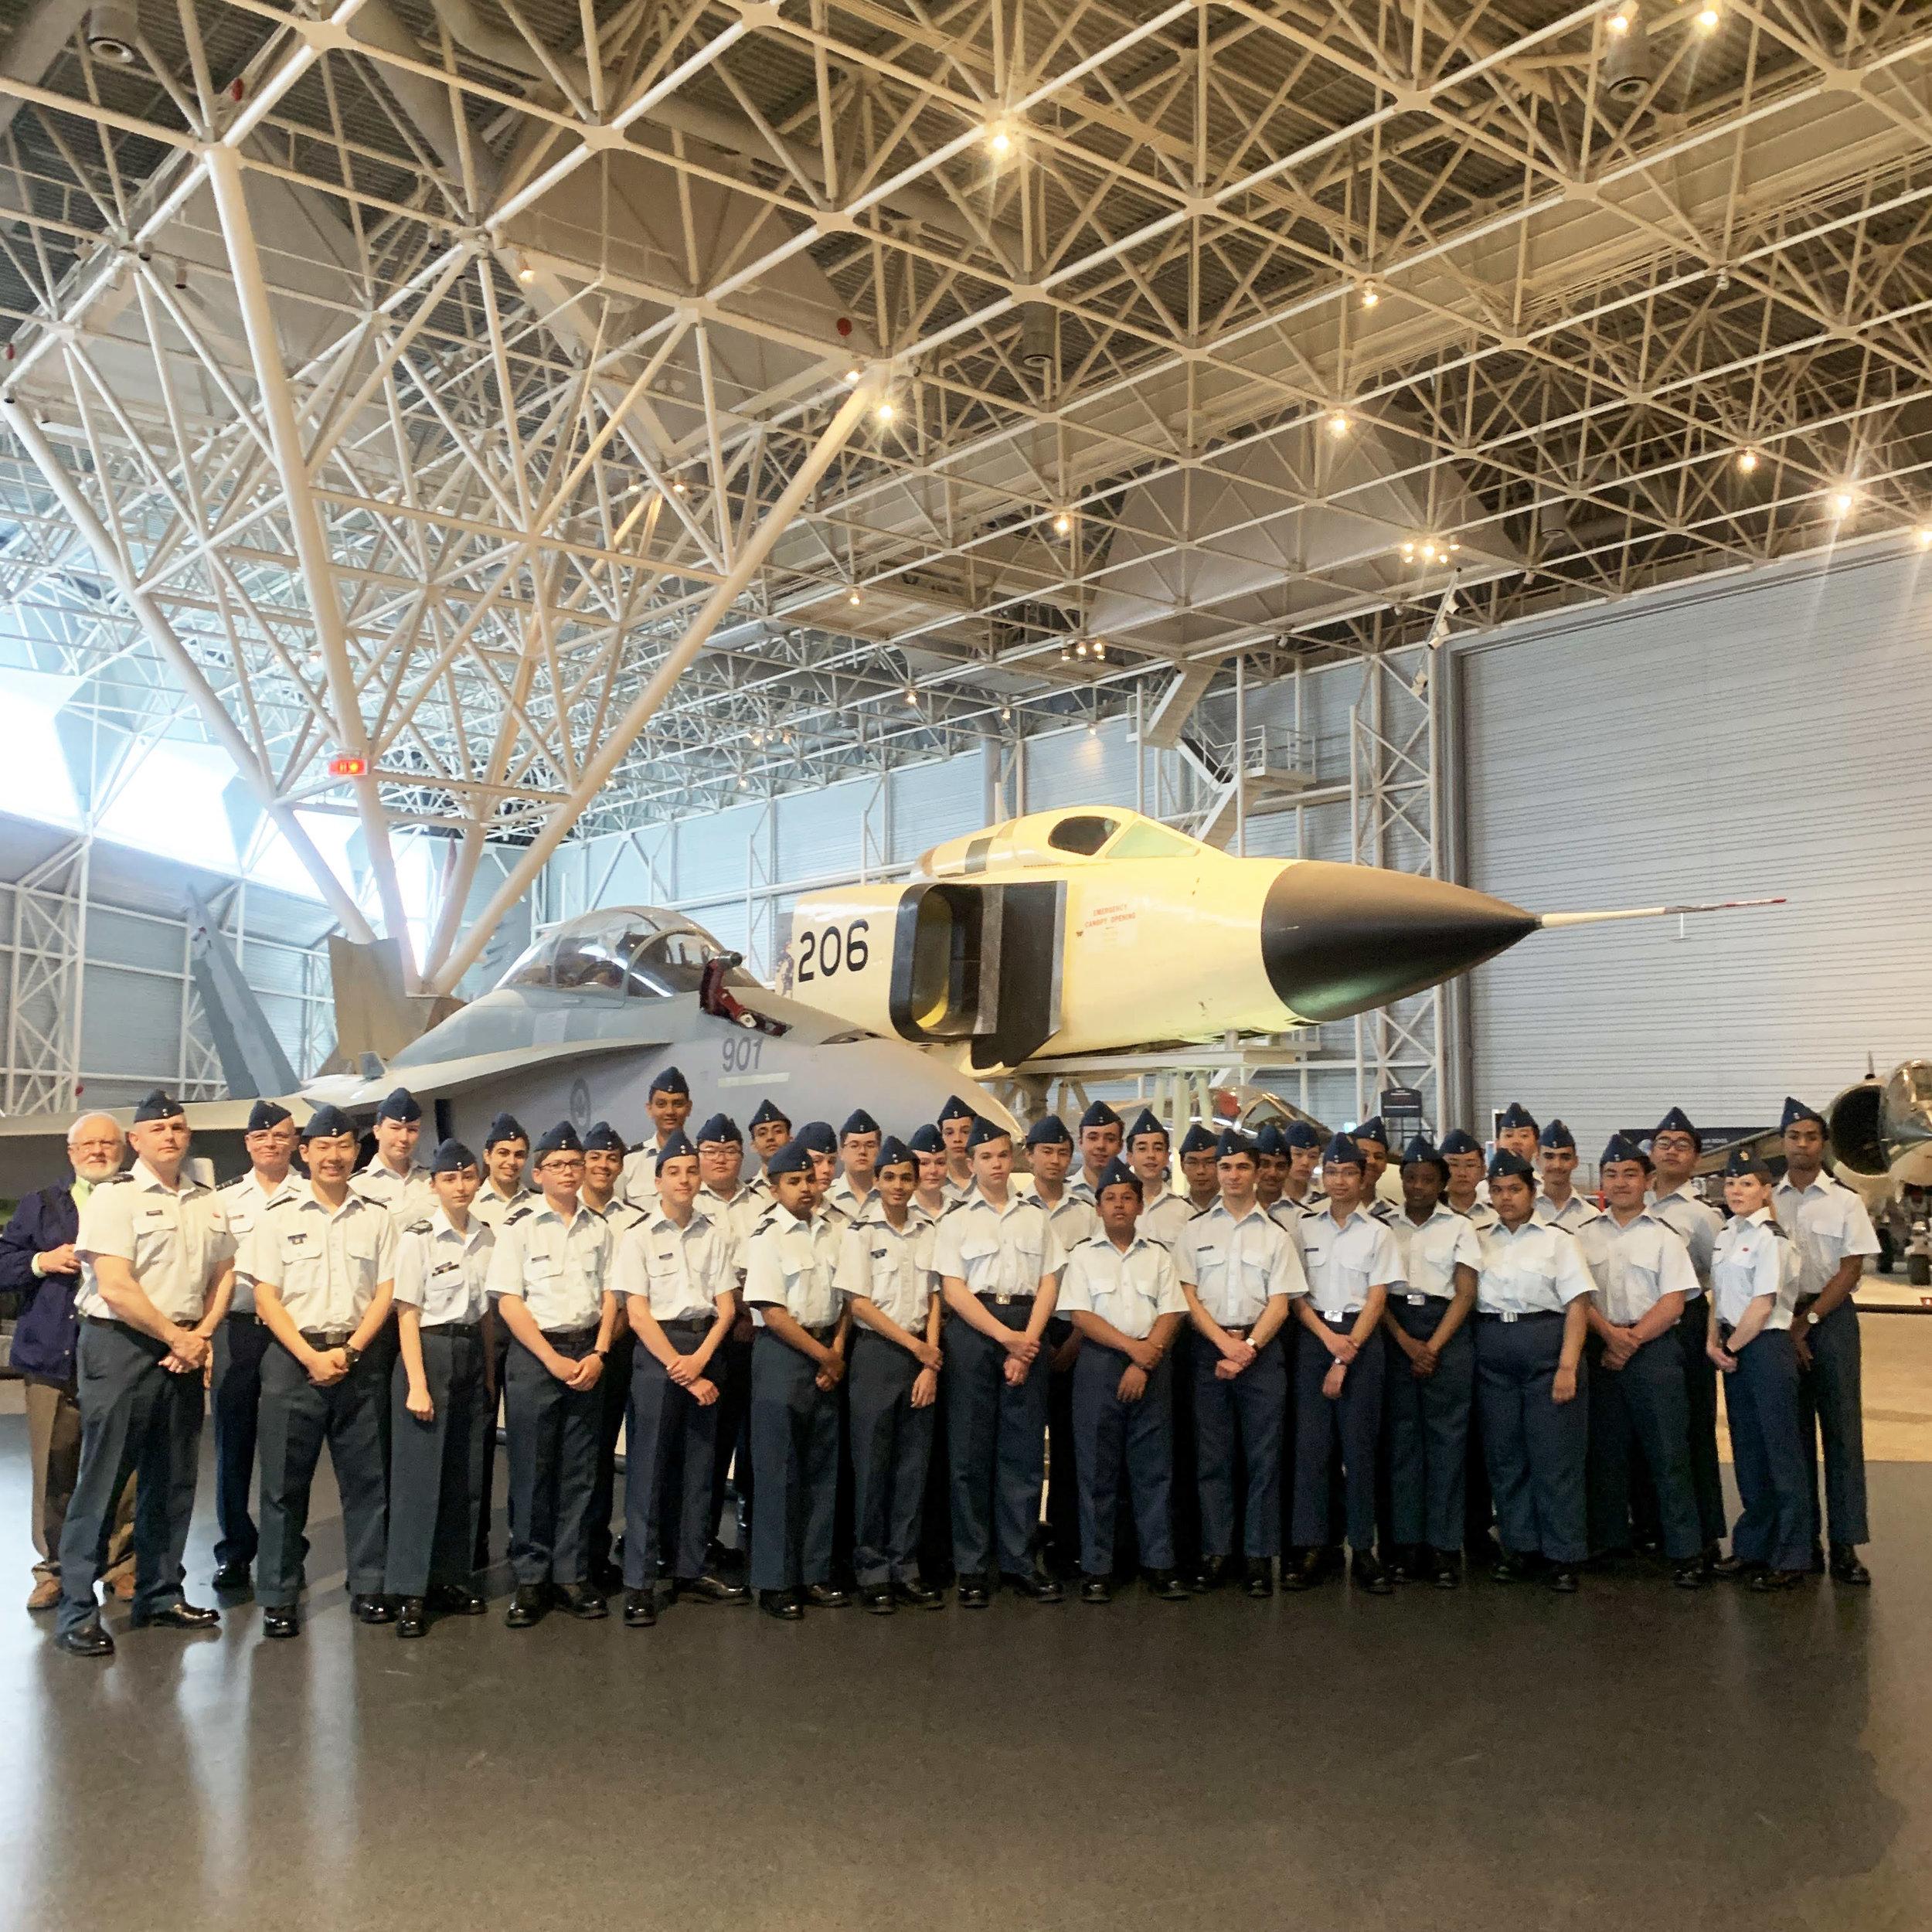 Canada aviation & Space museum